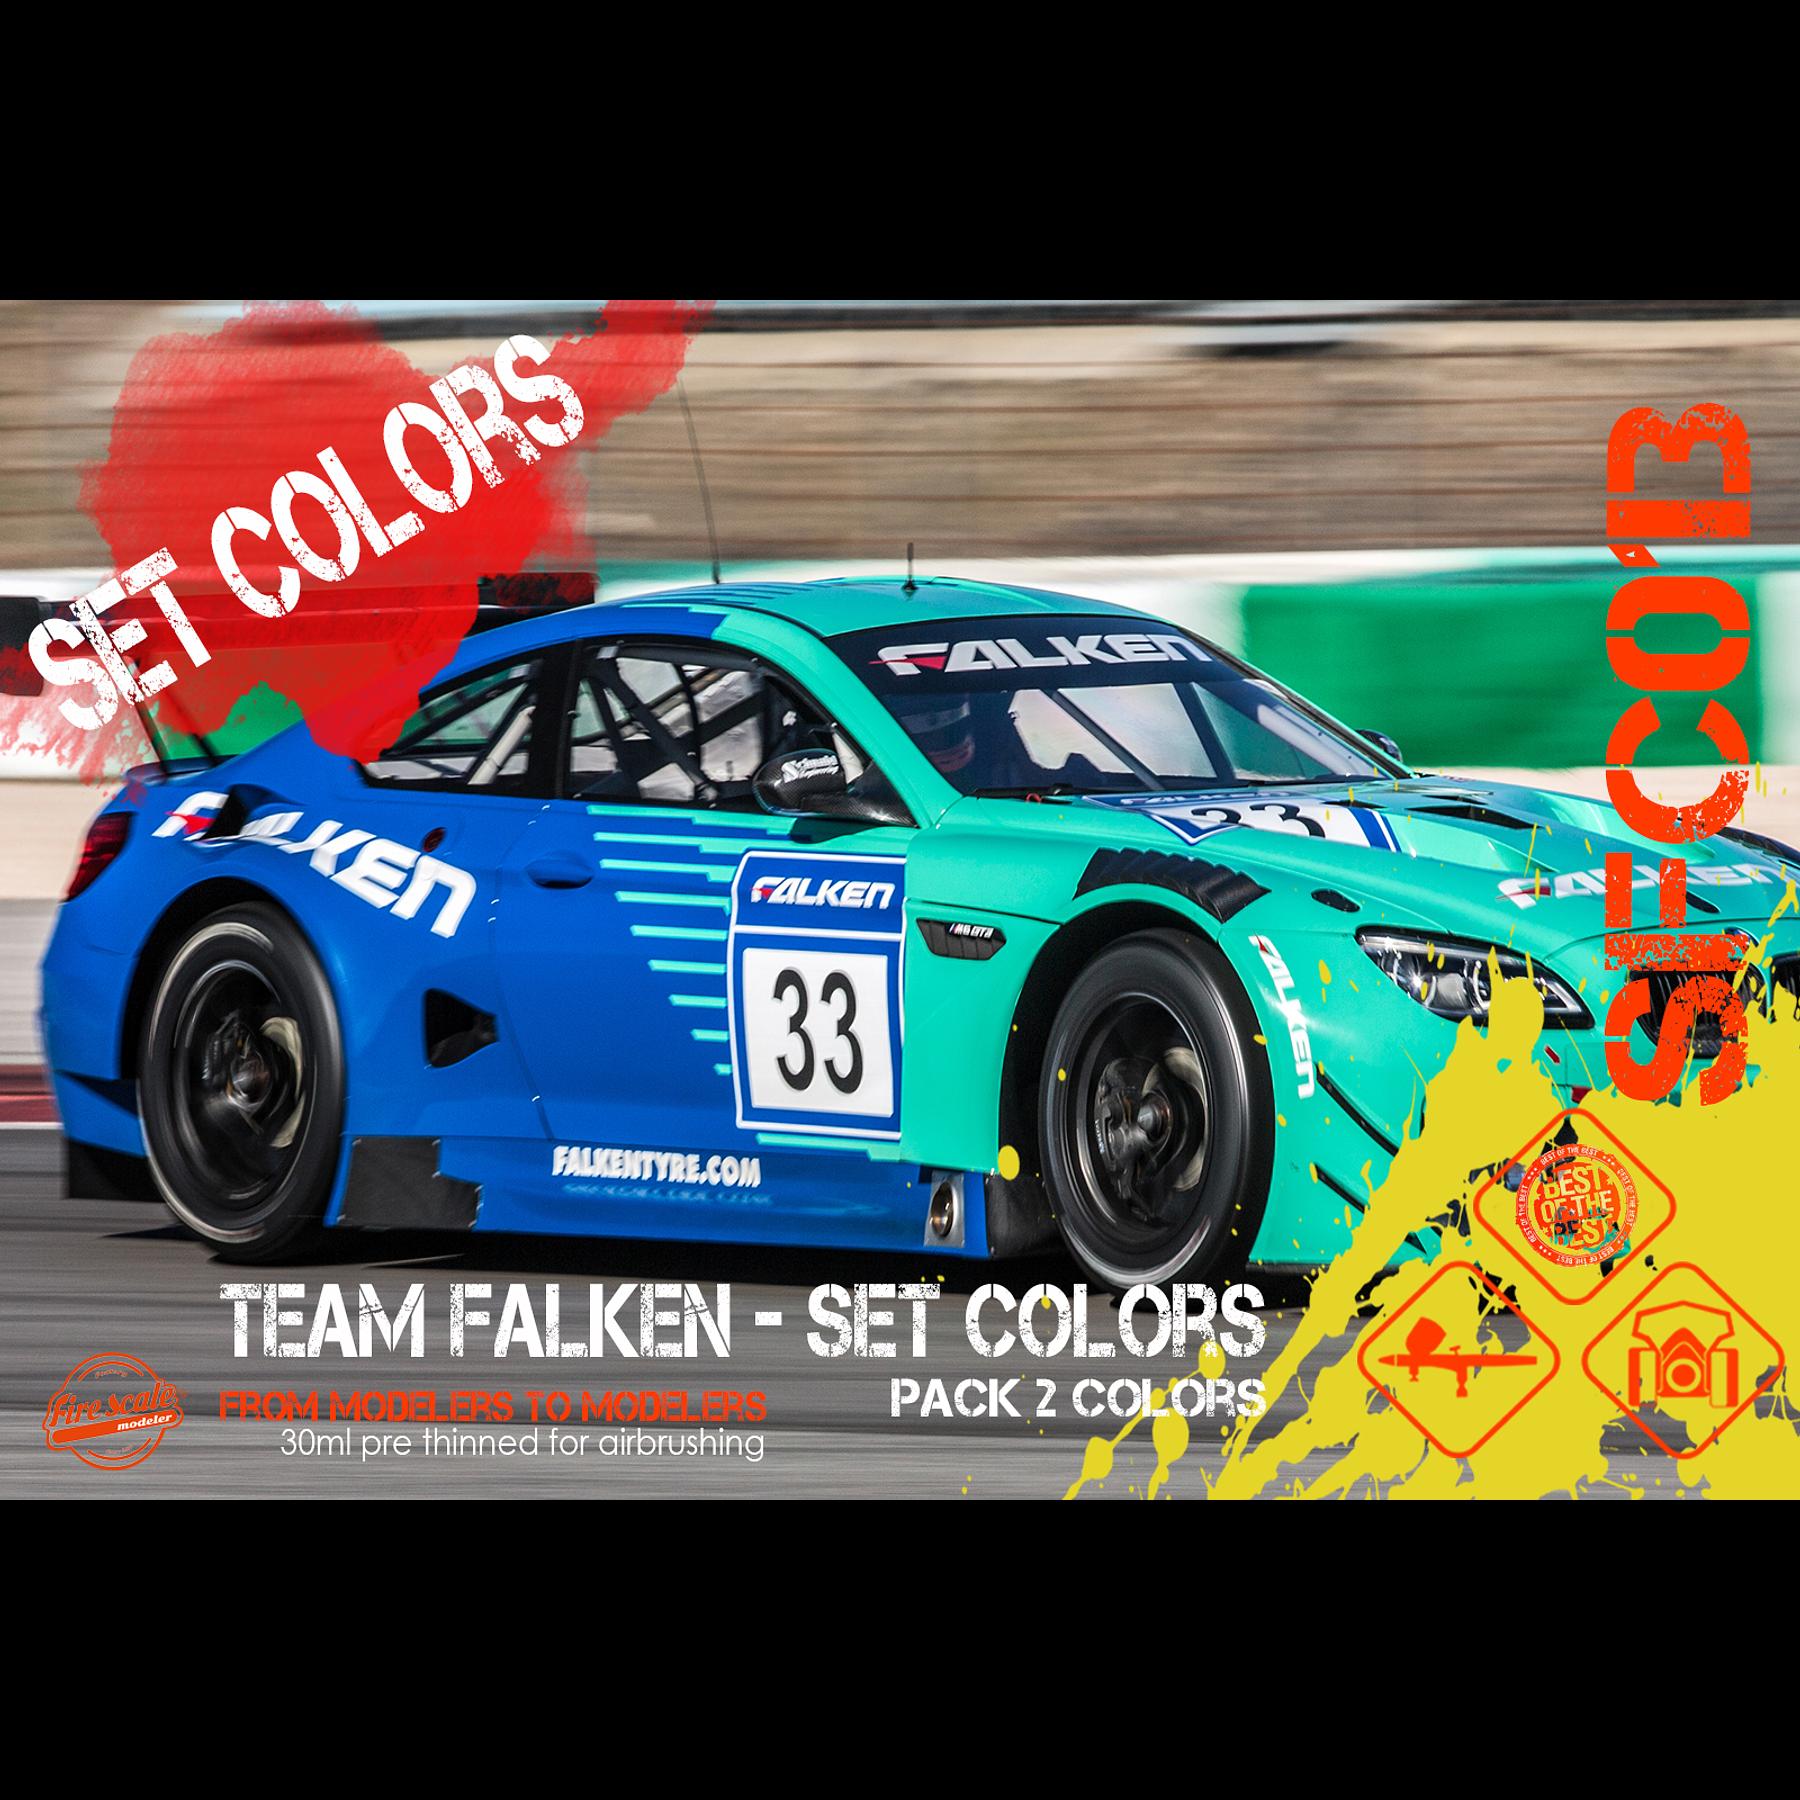 Team Falken Set Colors